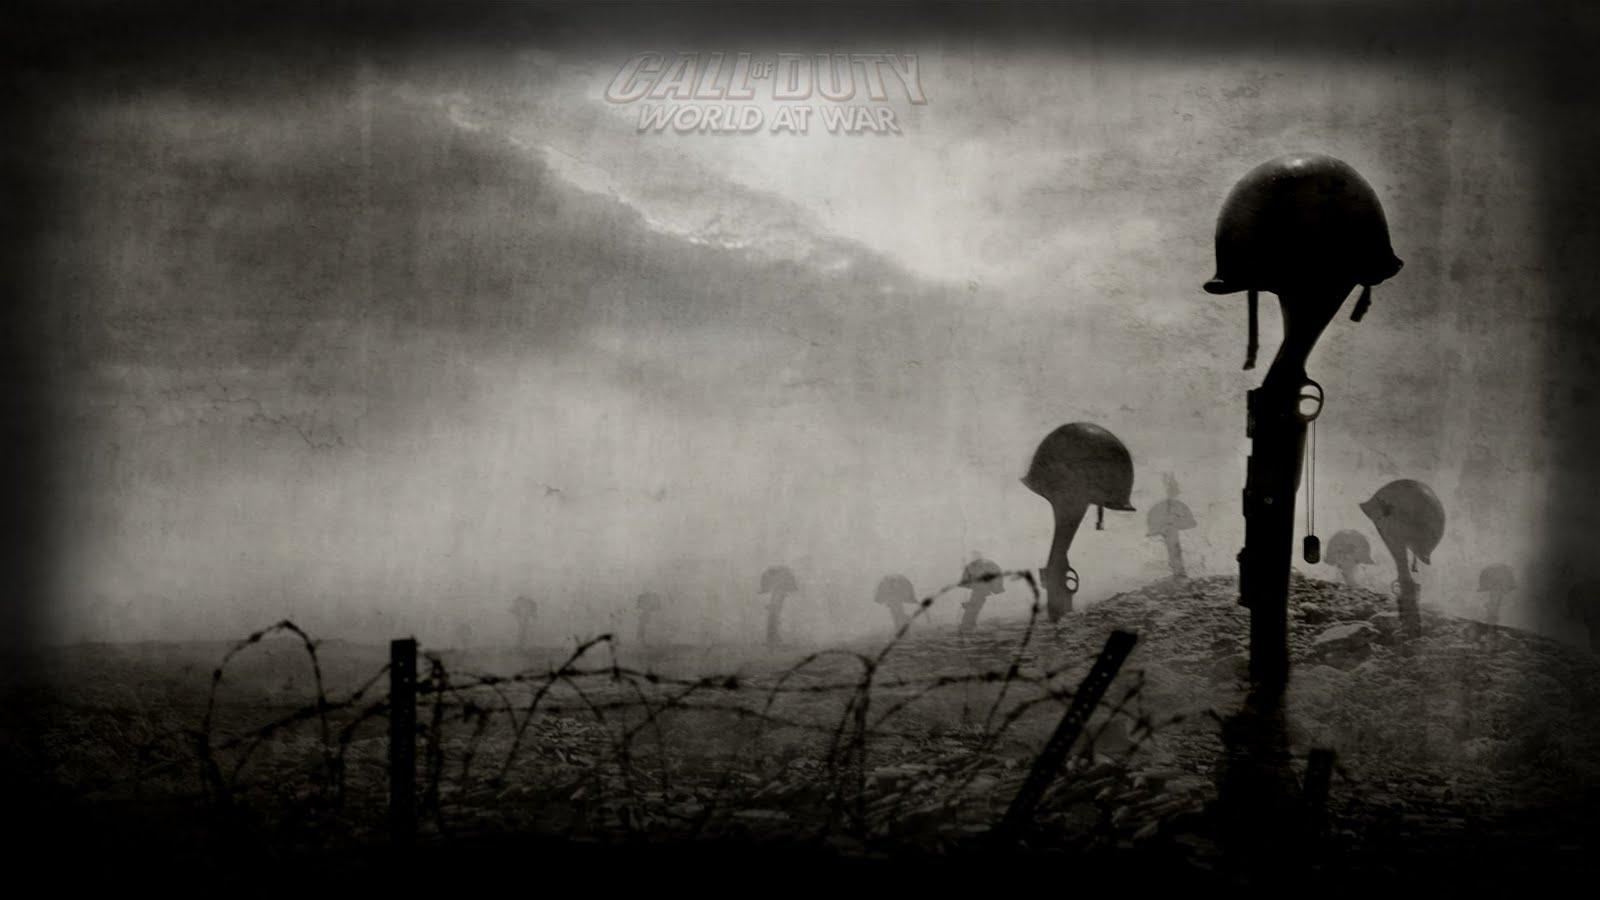 Call Of Duty World At War Wallpaper: Esther Castillo: Call Of Duty World At War Wallpaper